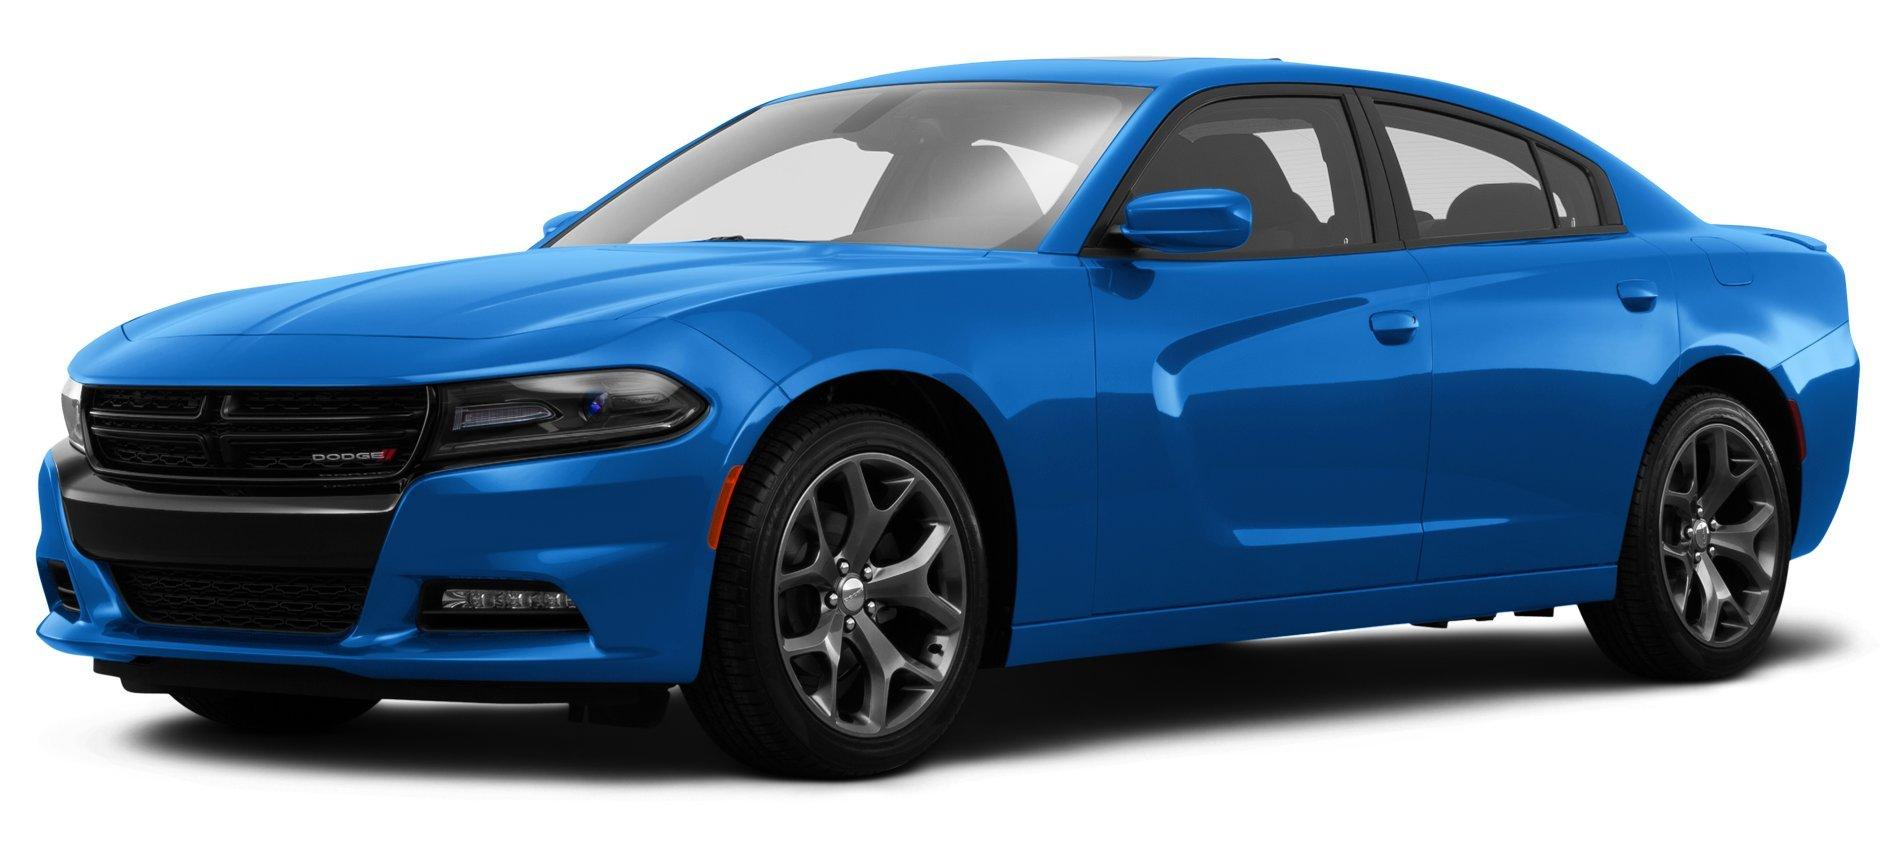 2010 DODGE CHARGER OWNERS MANUAL R//T SRT8 SE SXT SEDAN USER V8 V6 OEM 10